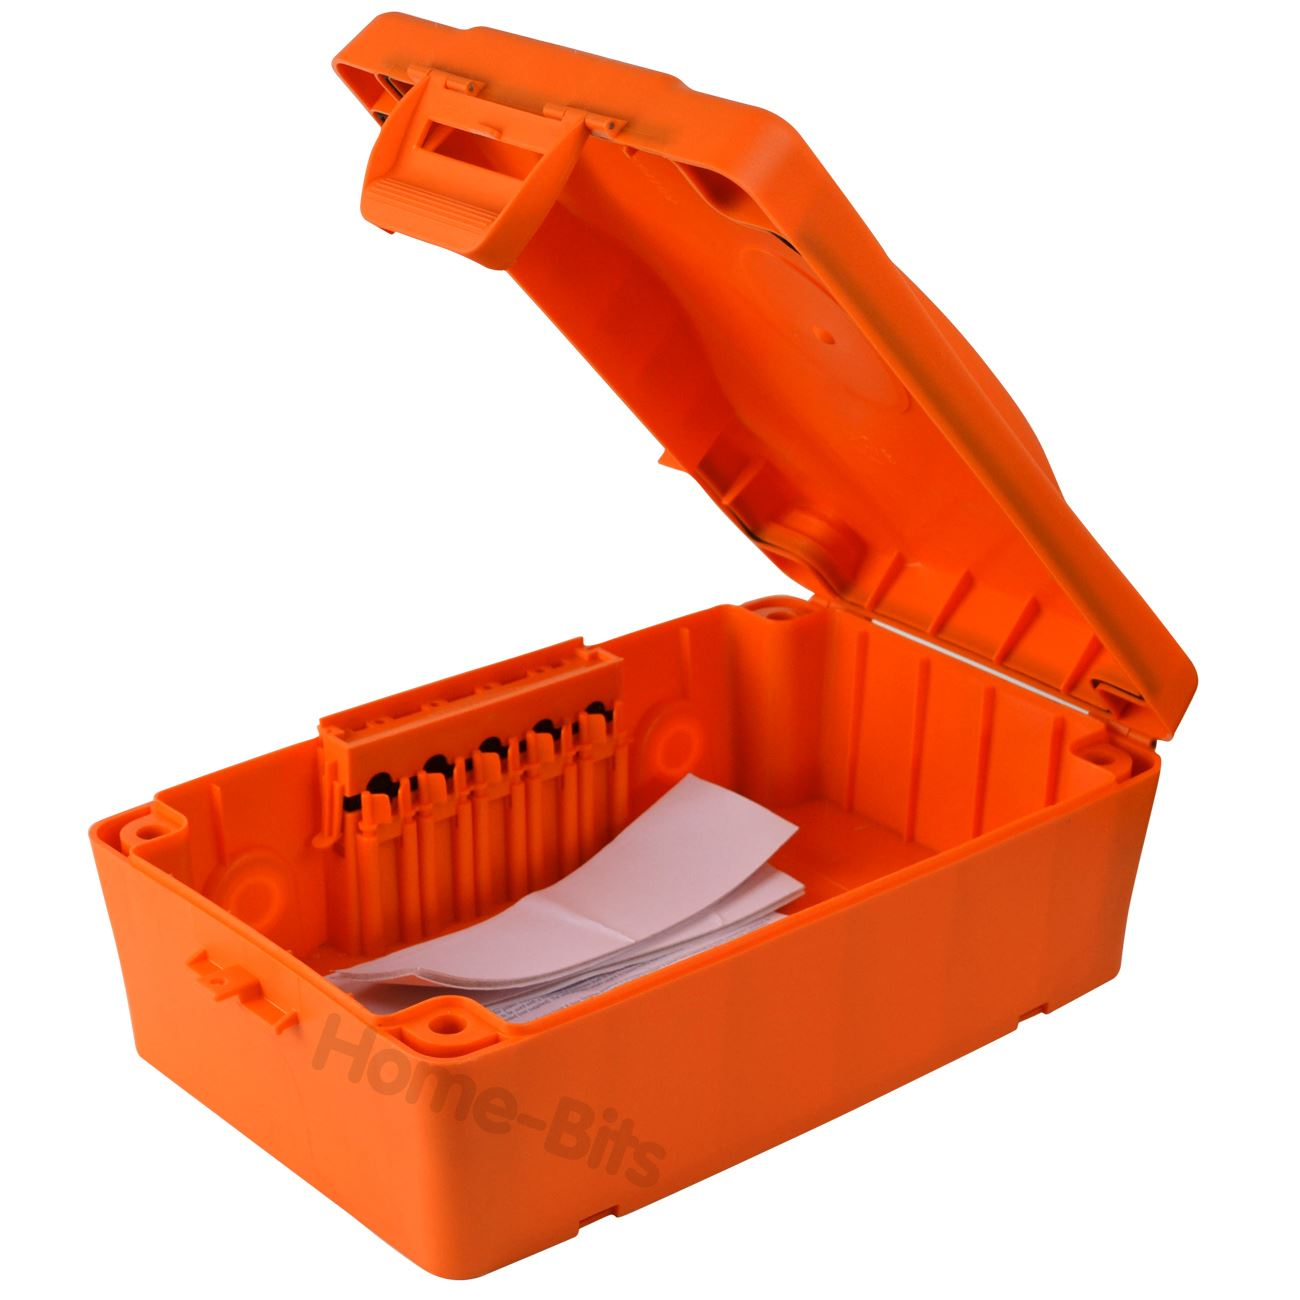 masterplug weatherproof enclosure junction box for outdoor